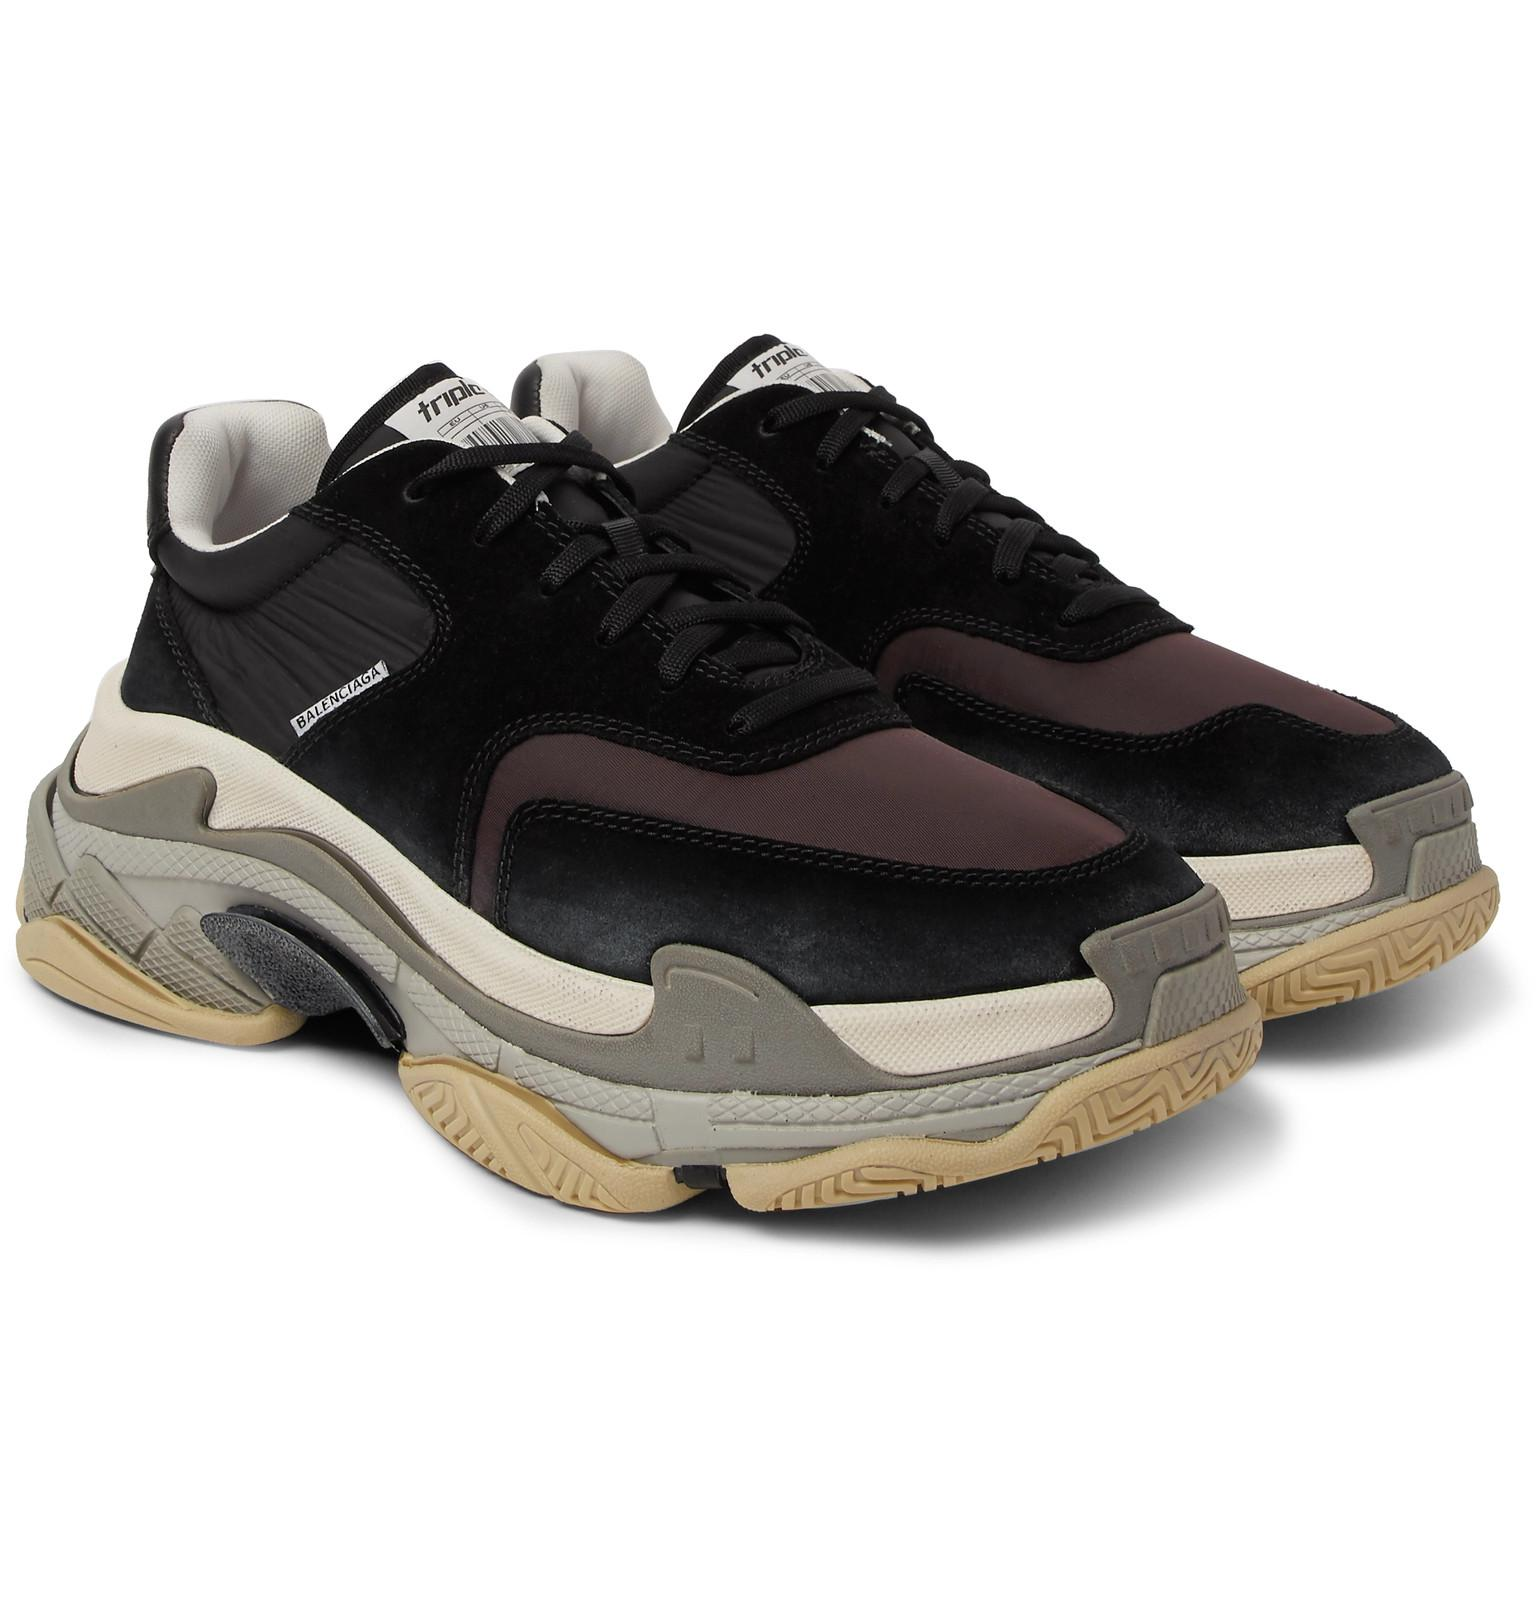 8f7e6b816 Balenciaga Triple S Nylon, Mesh, Suede And Leather Sneakers in Black ...